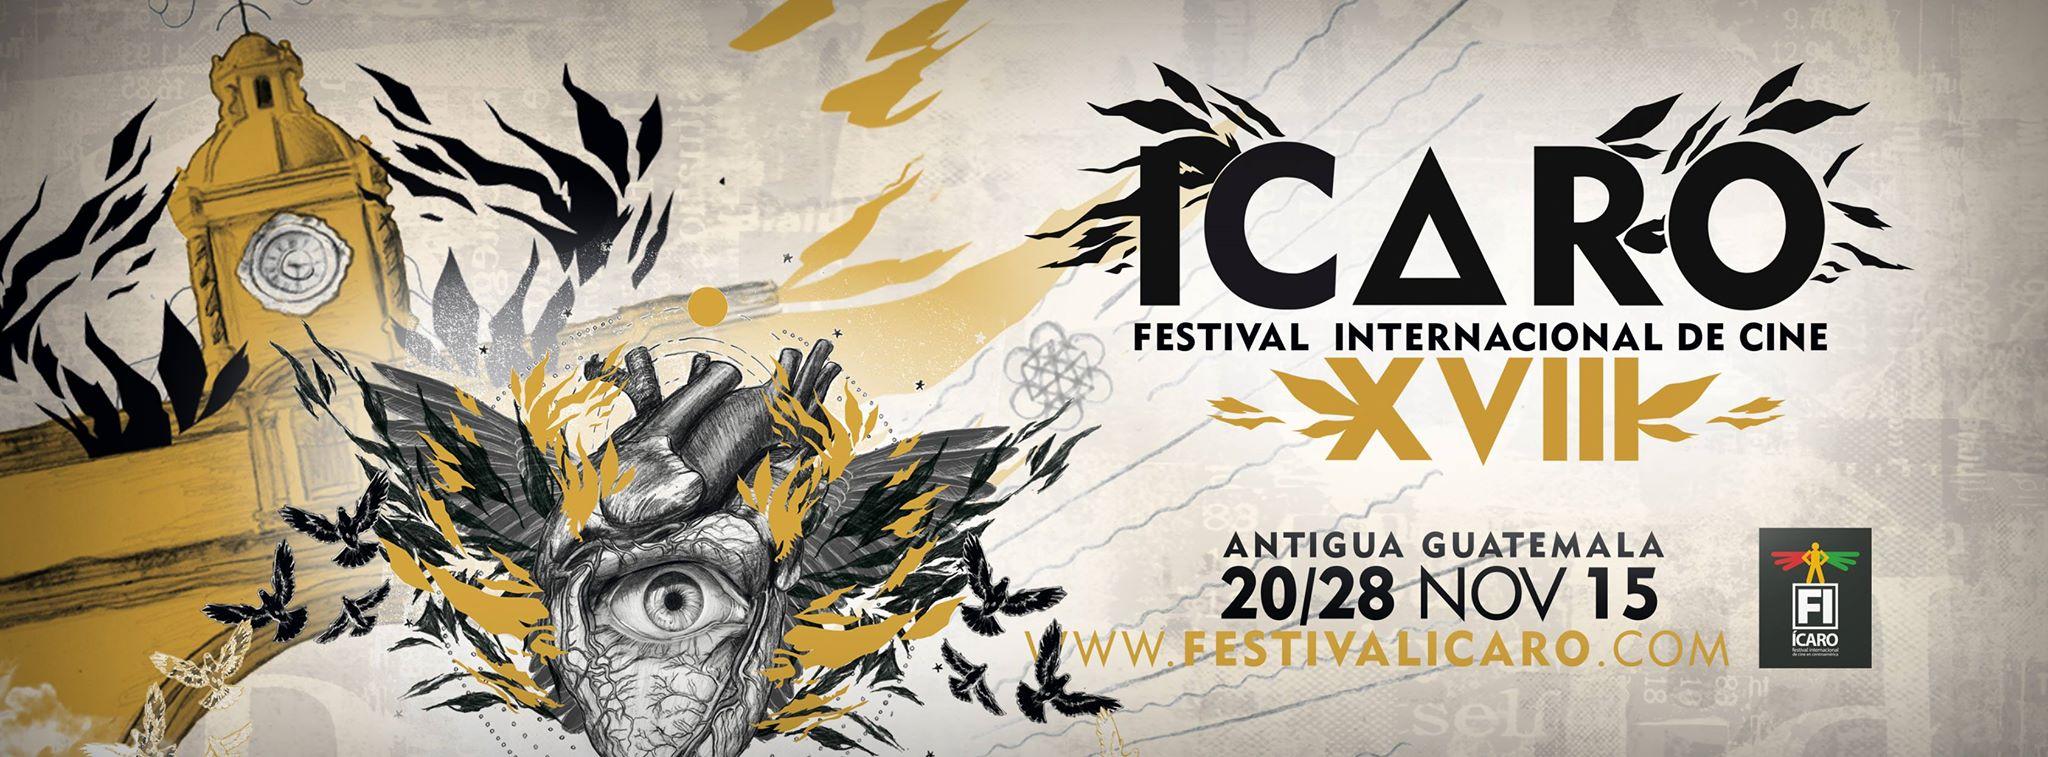 Festival Internacional de Cine ICARO 2015